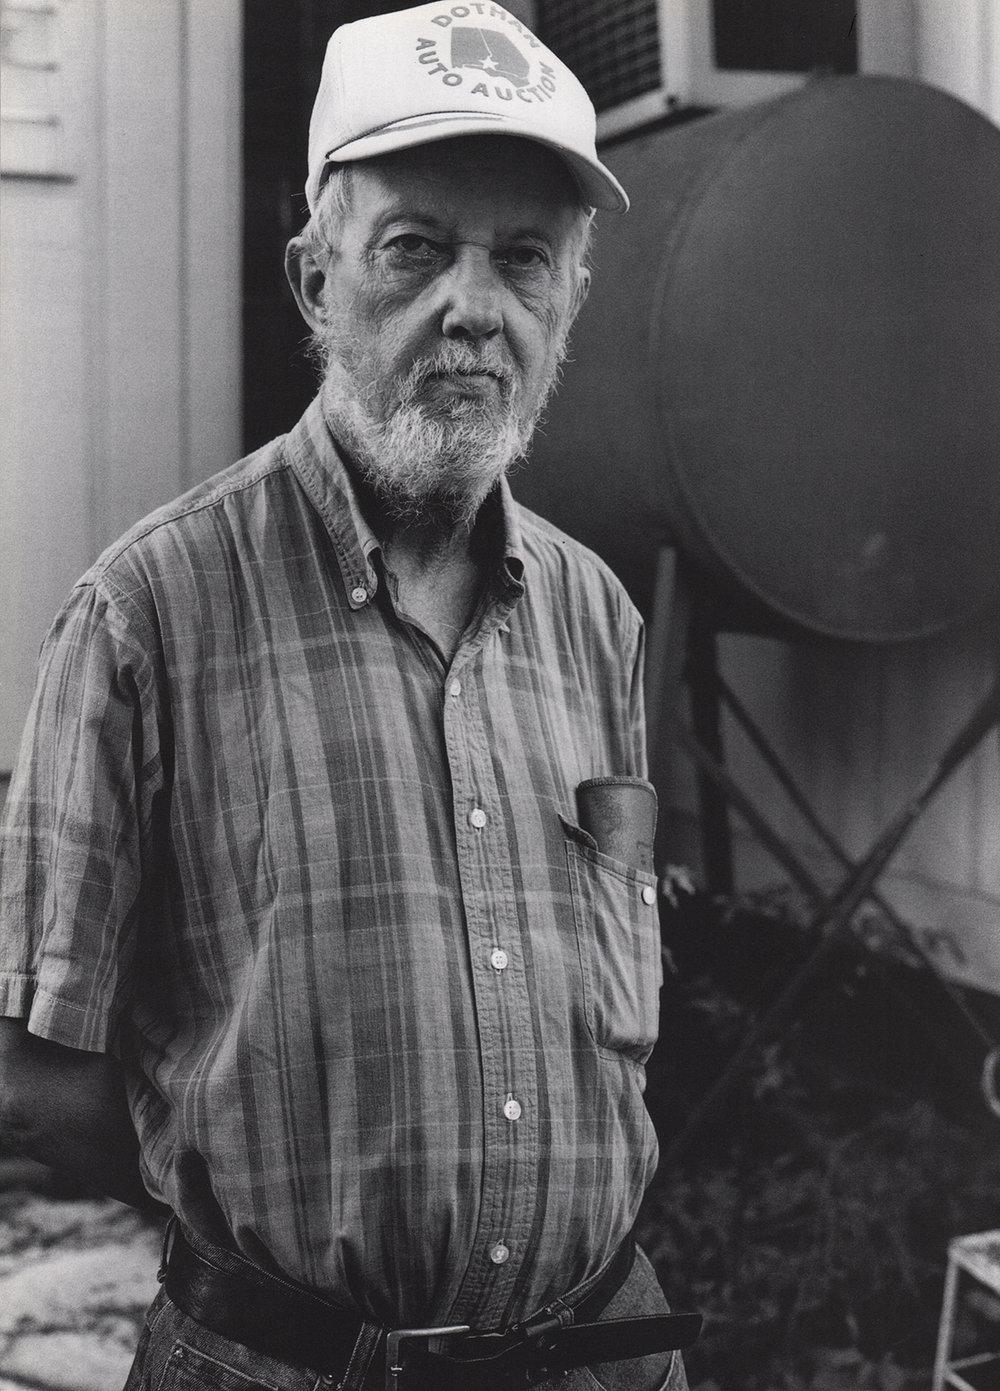 Gene Merritt, photo by Mario Del Curto